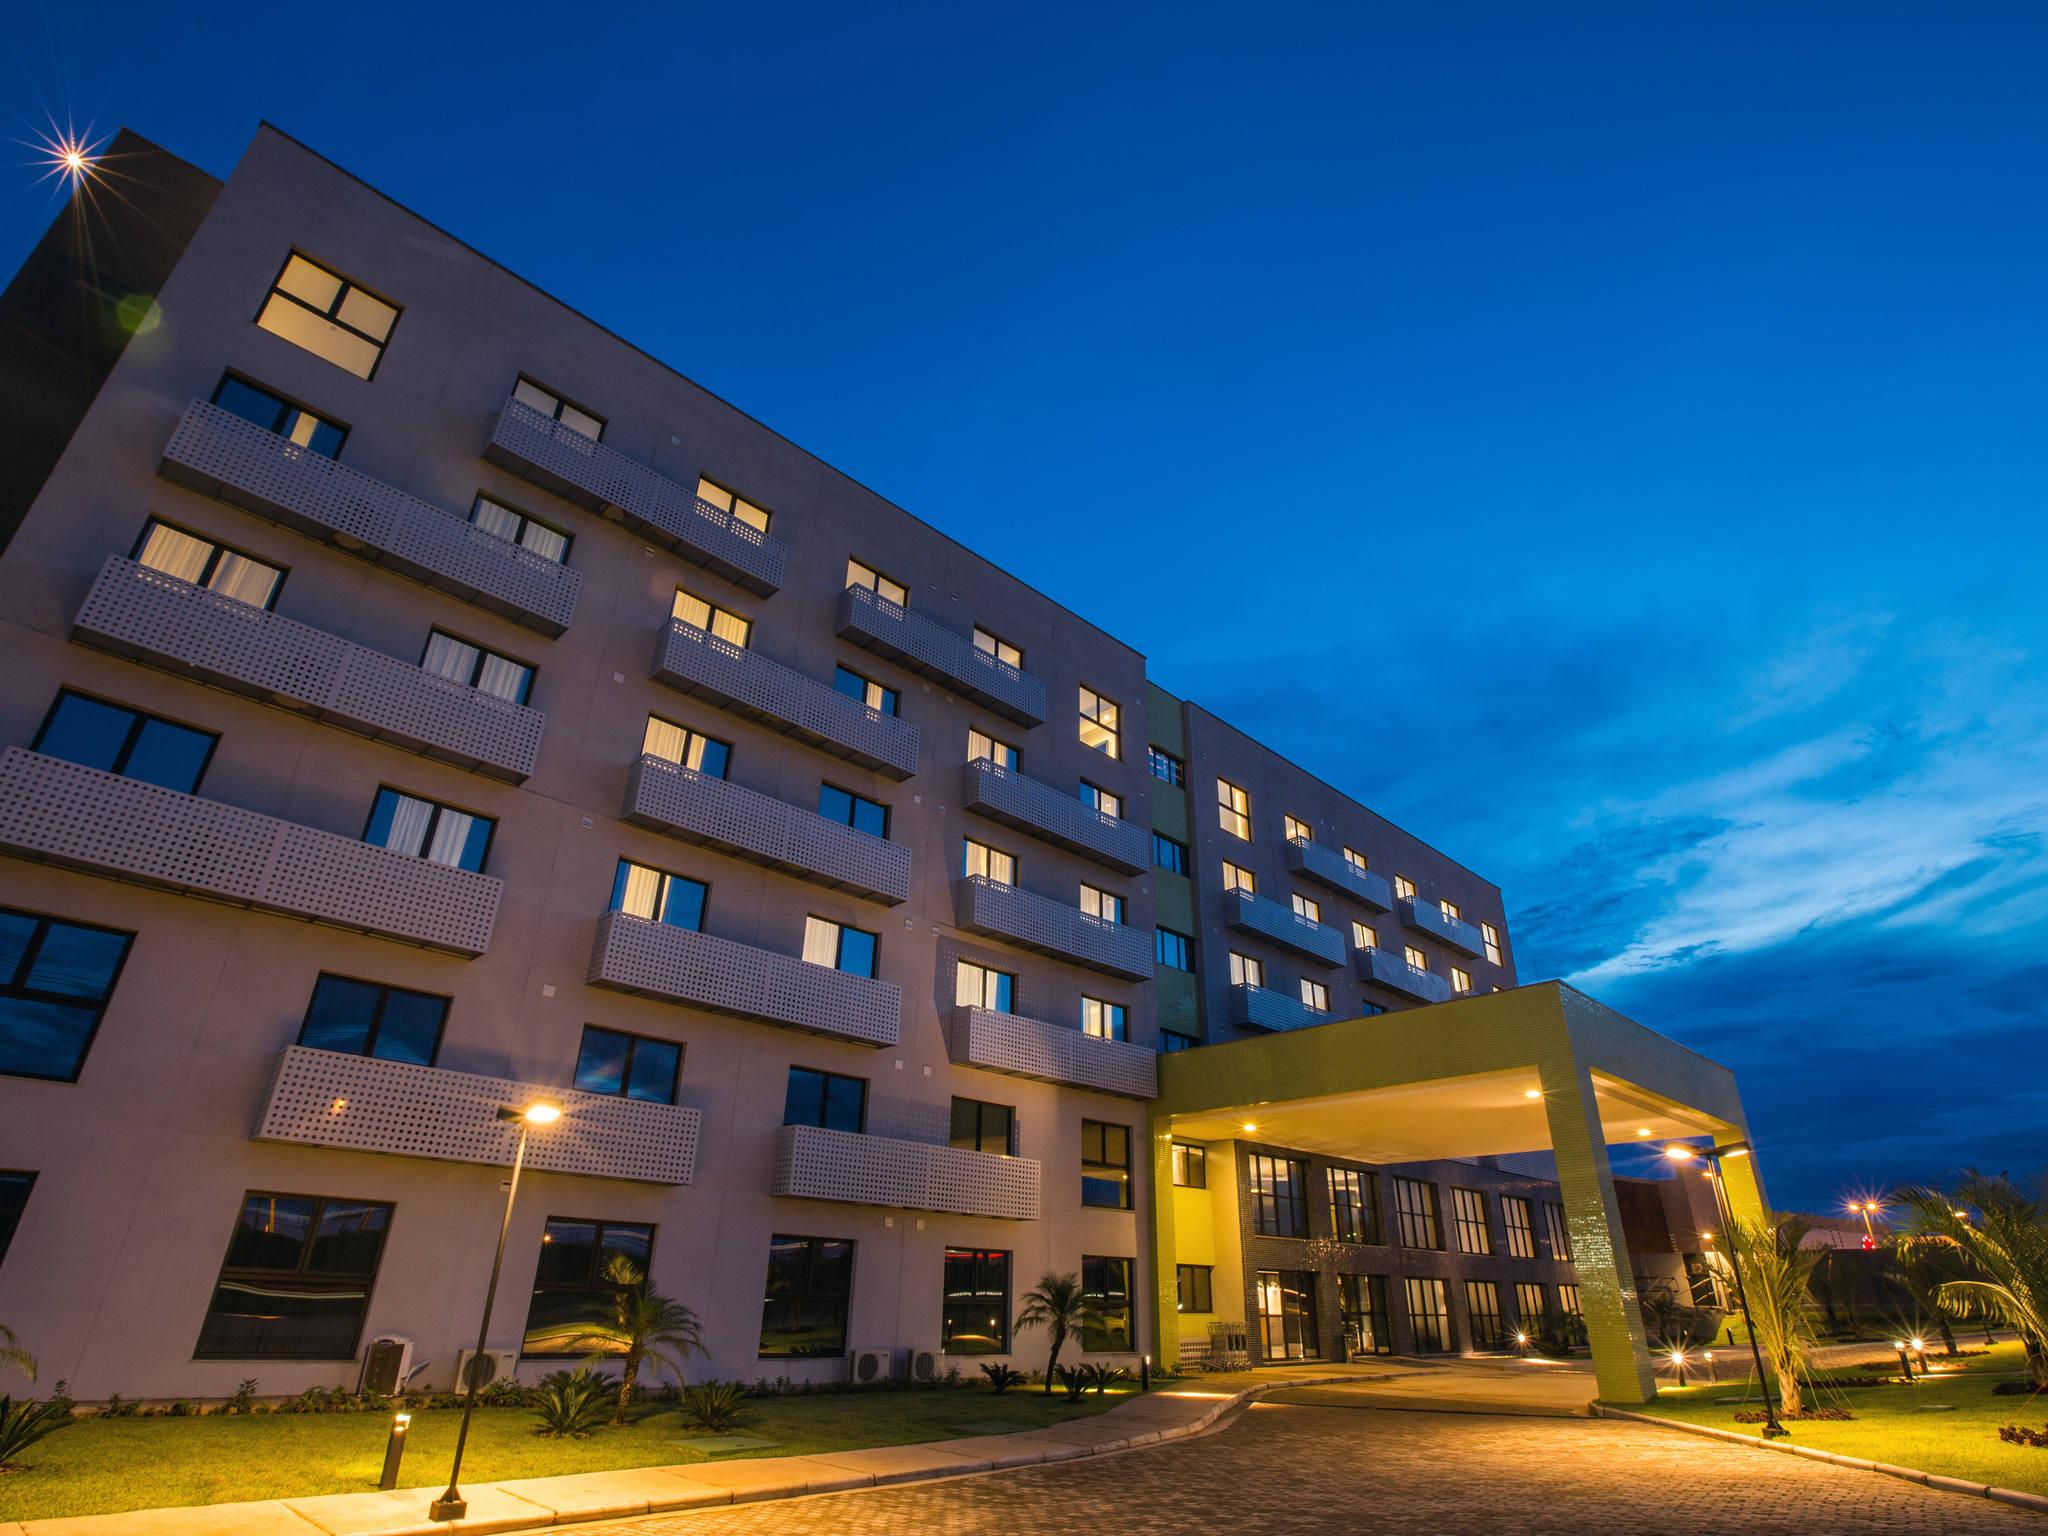 Отель — ibis Styles Parauapebas (Opening June 2018)